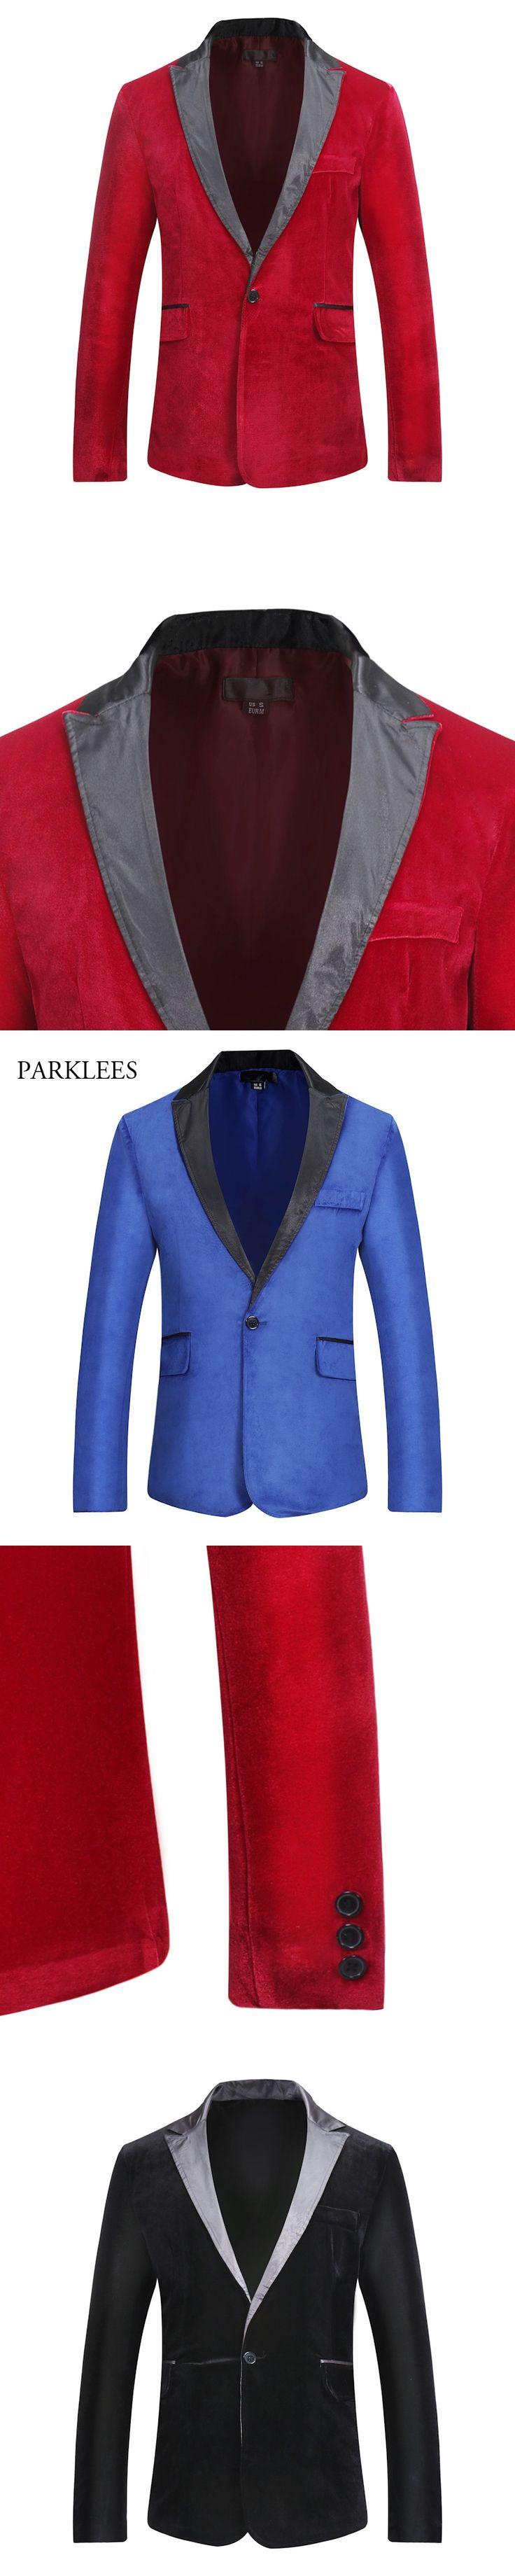 Royal Blue Velvet Blazer Men 2017 Patchwork Collar Single Breasted Mens Blazer Casual Slim Fit Party Suit Jacket Costume Homme